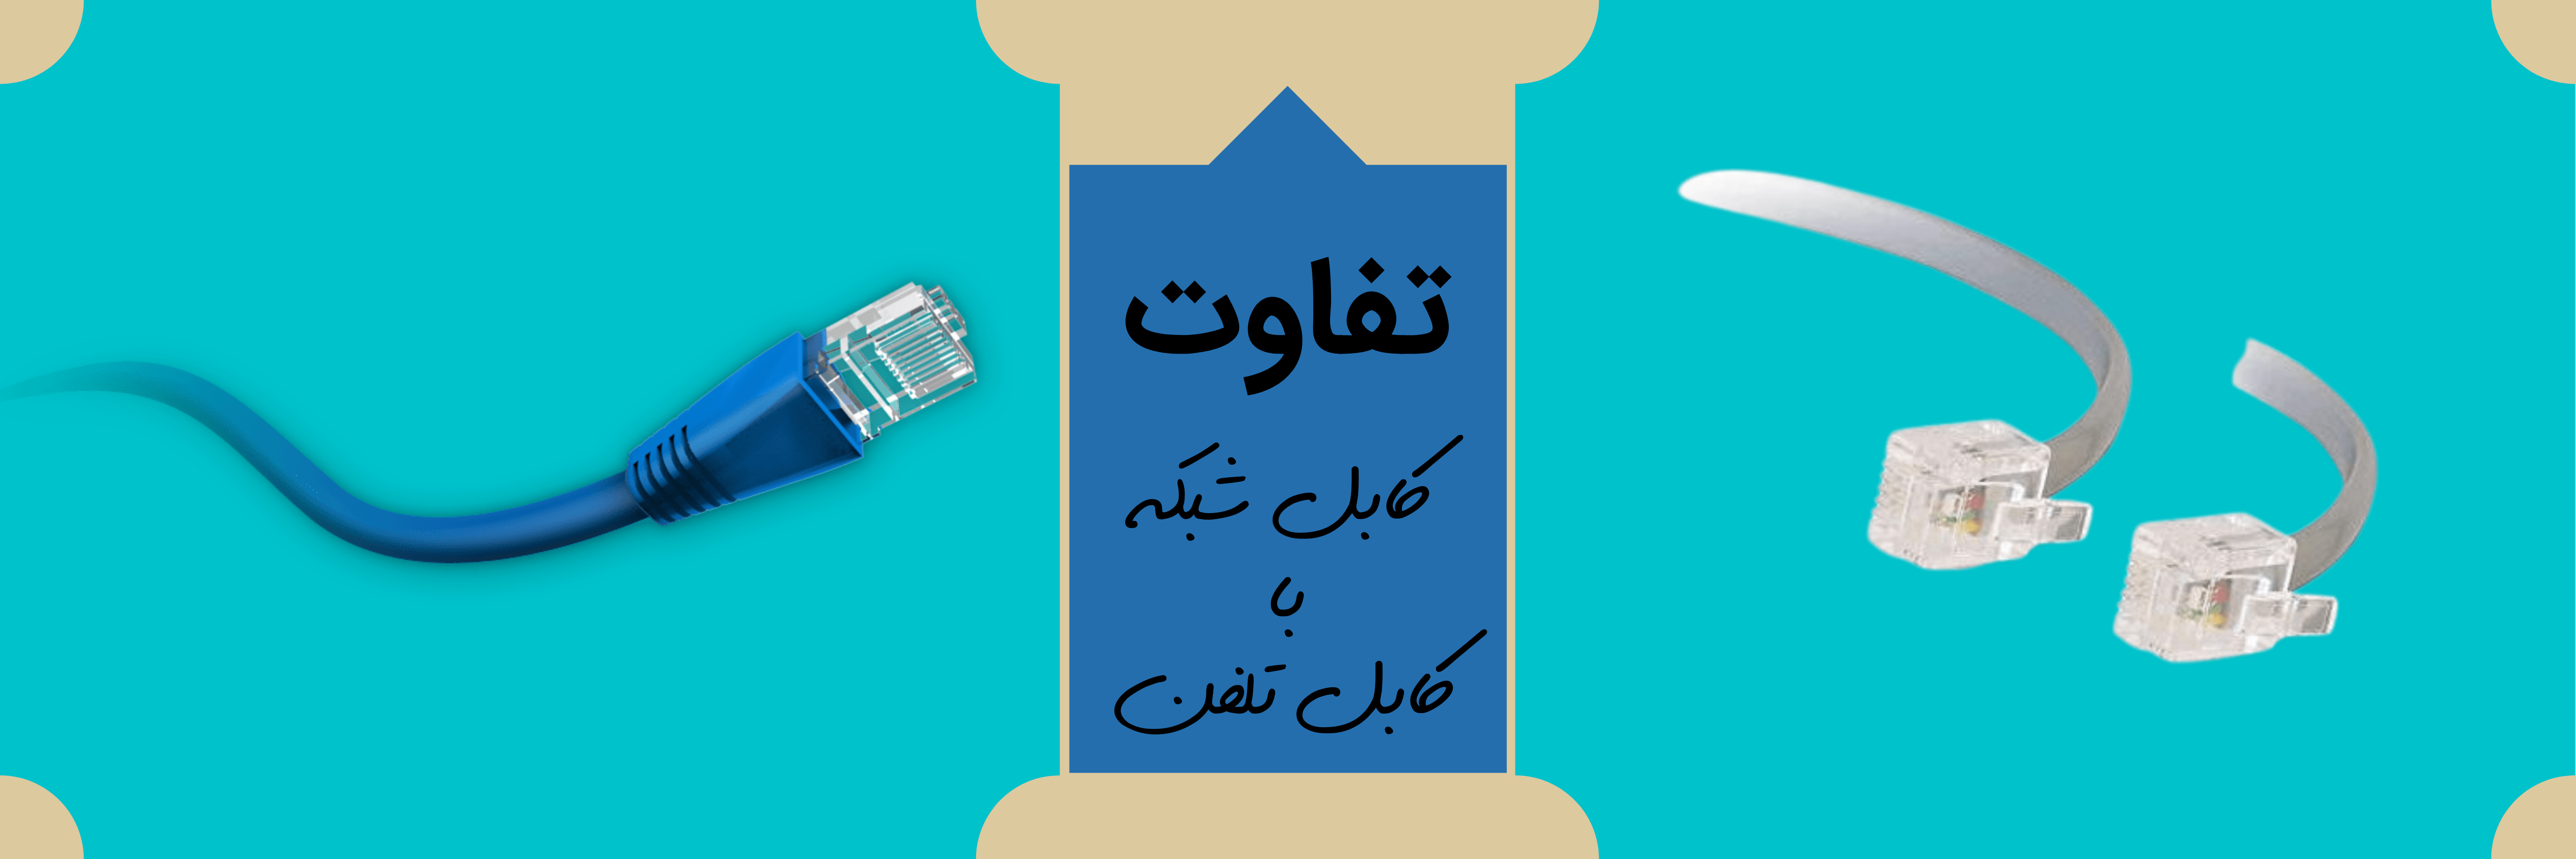 تفاوت کابل شبکه و کابل تلفن